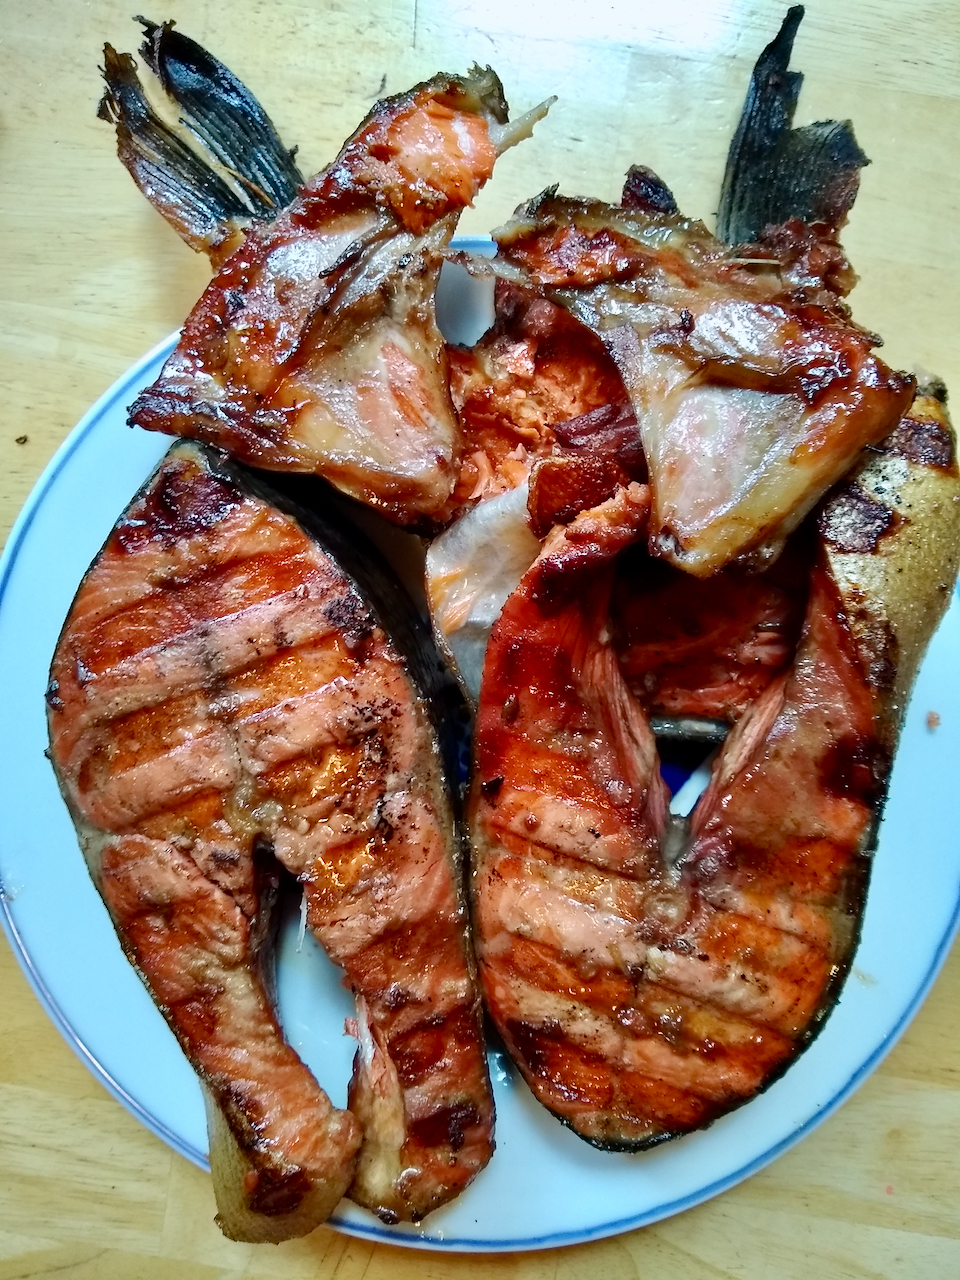 Salmon steaks by spear gun